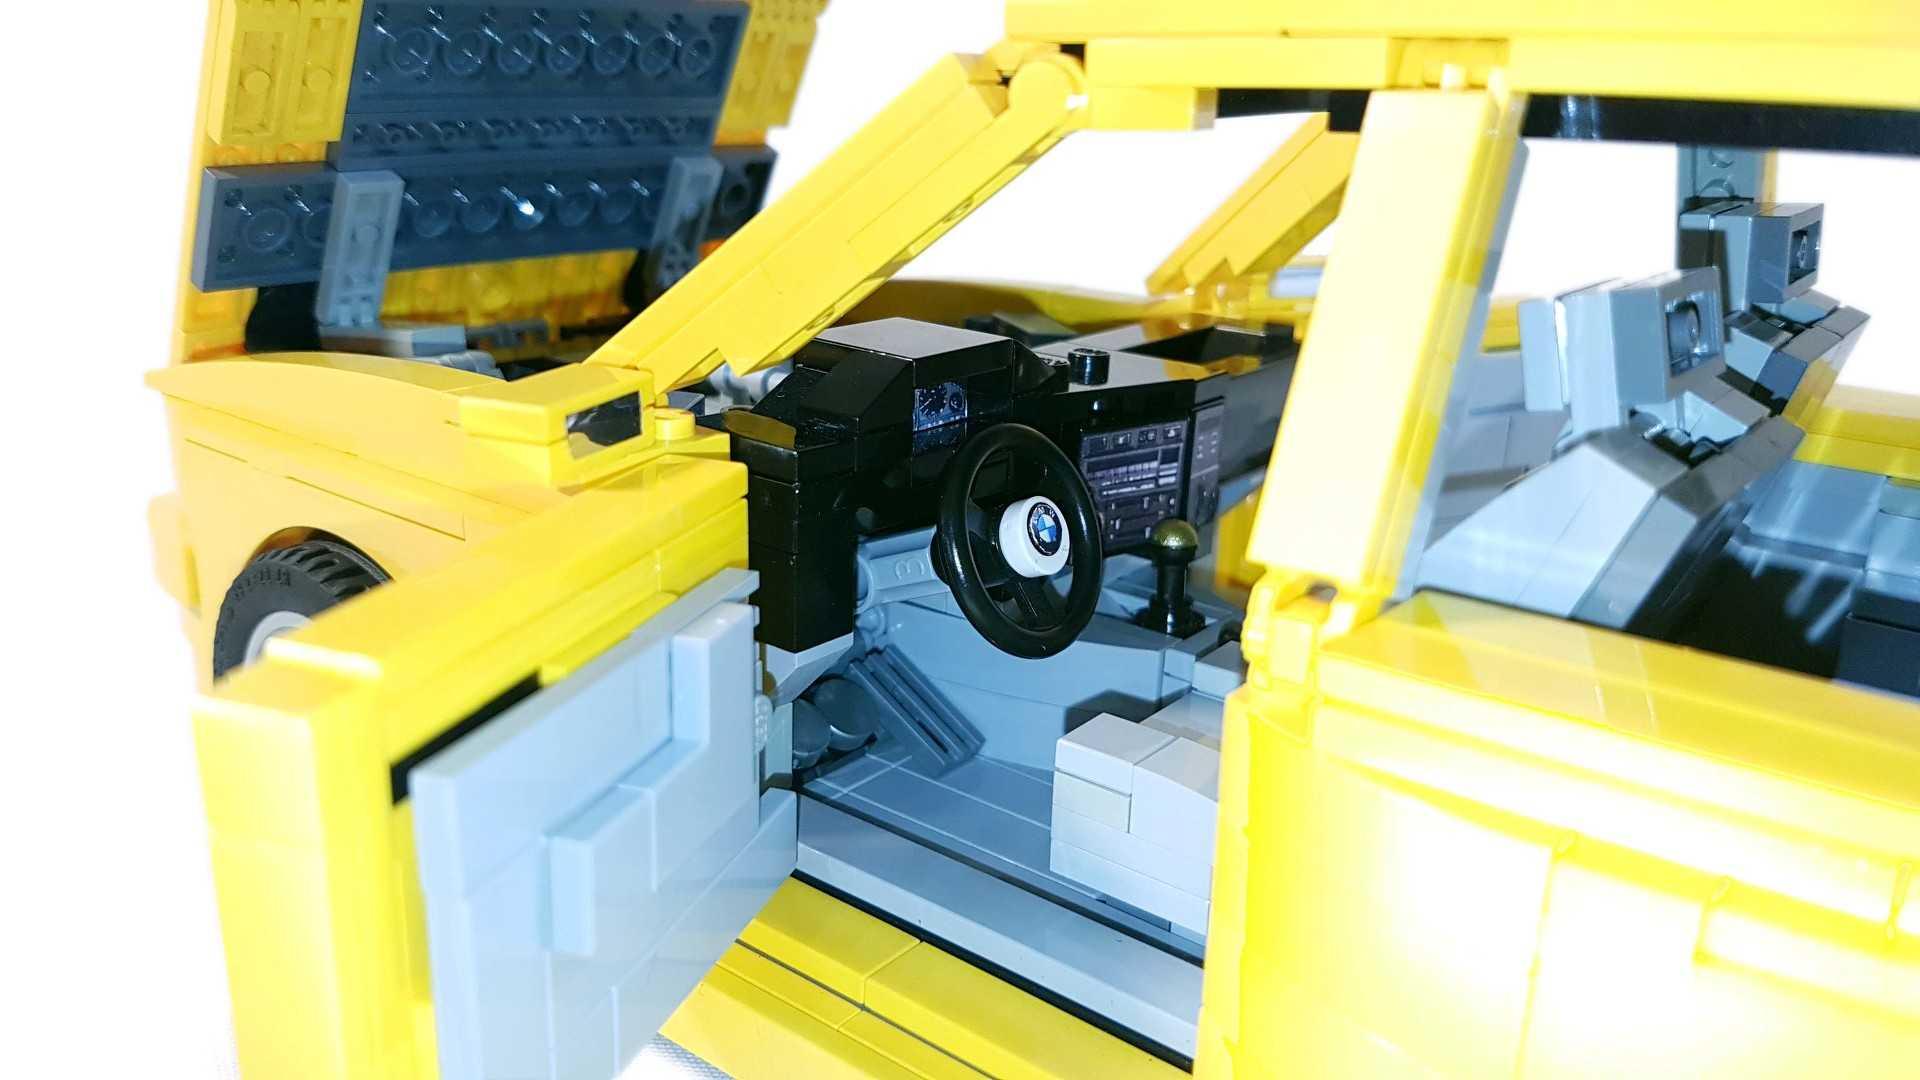 BMW E30 M3 Lego Ideas (18)